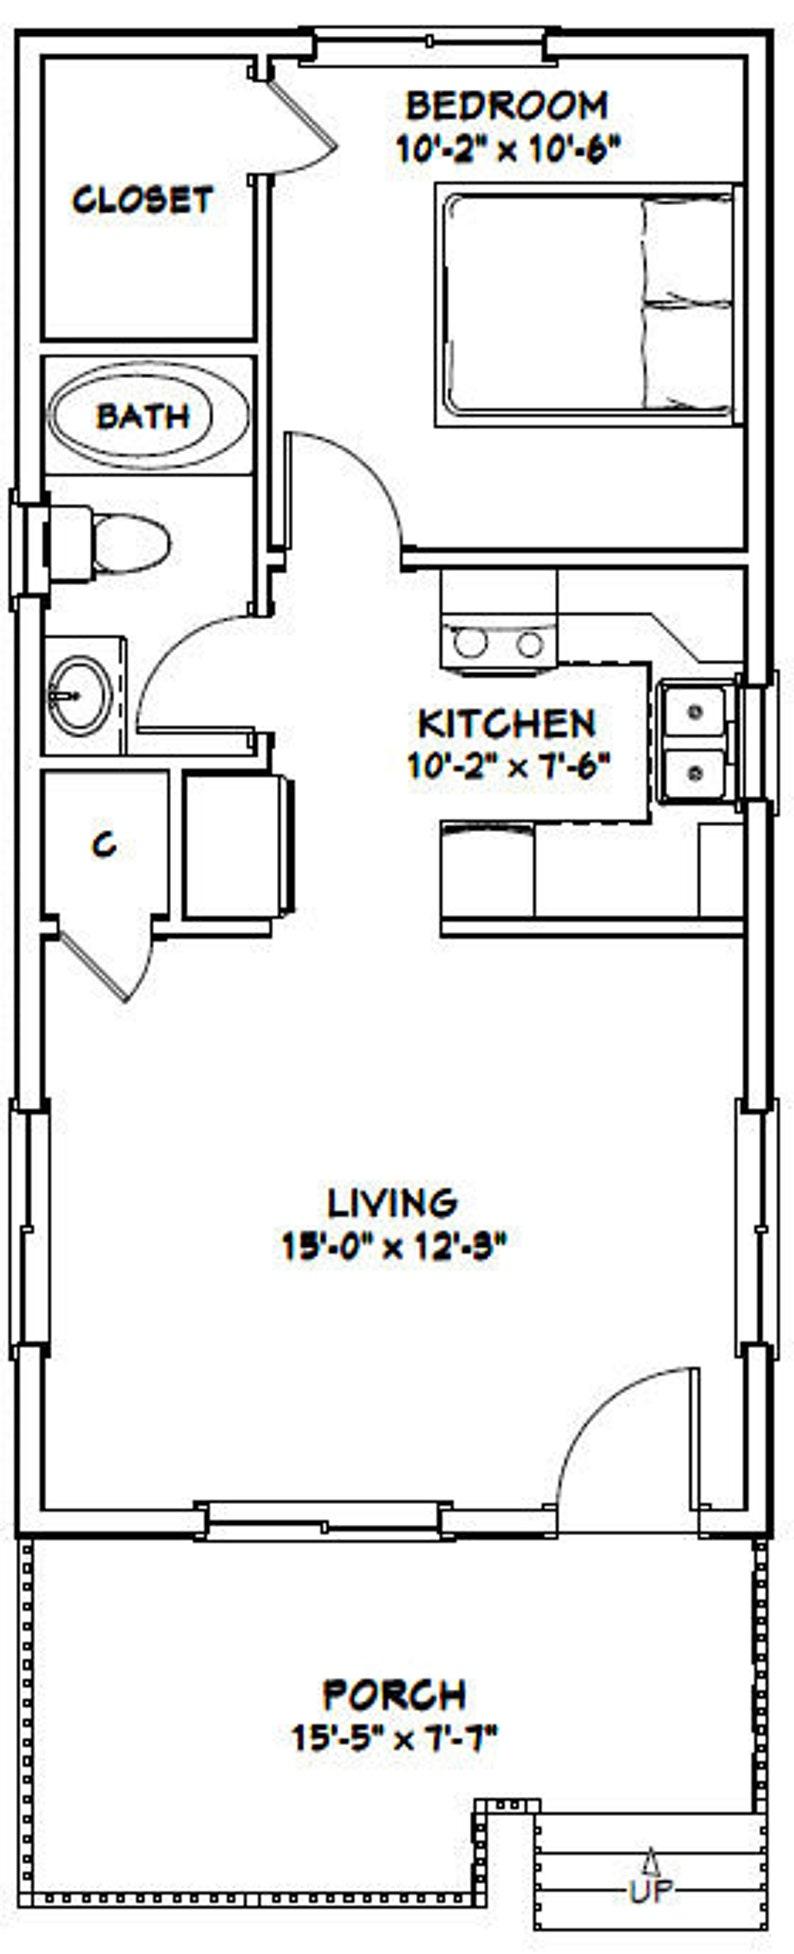 16x32 House 1-Bedroom 1-Bath 511 sq ft PDF Floor Plan   Etsy